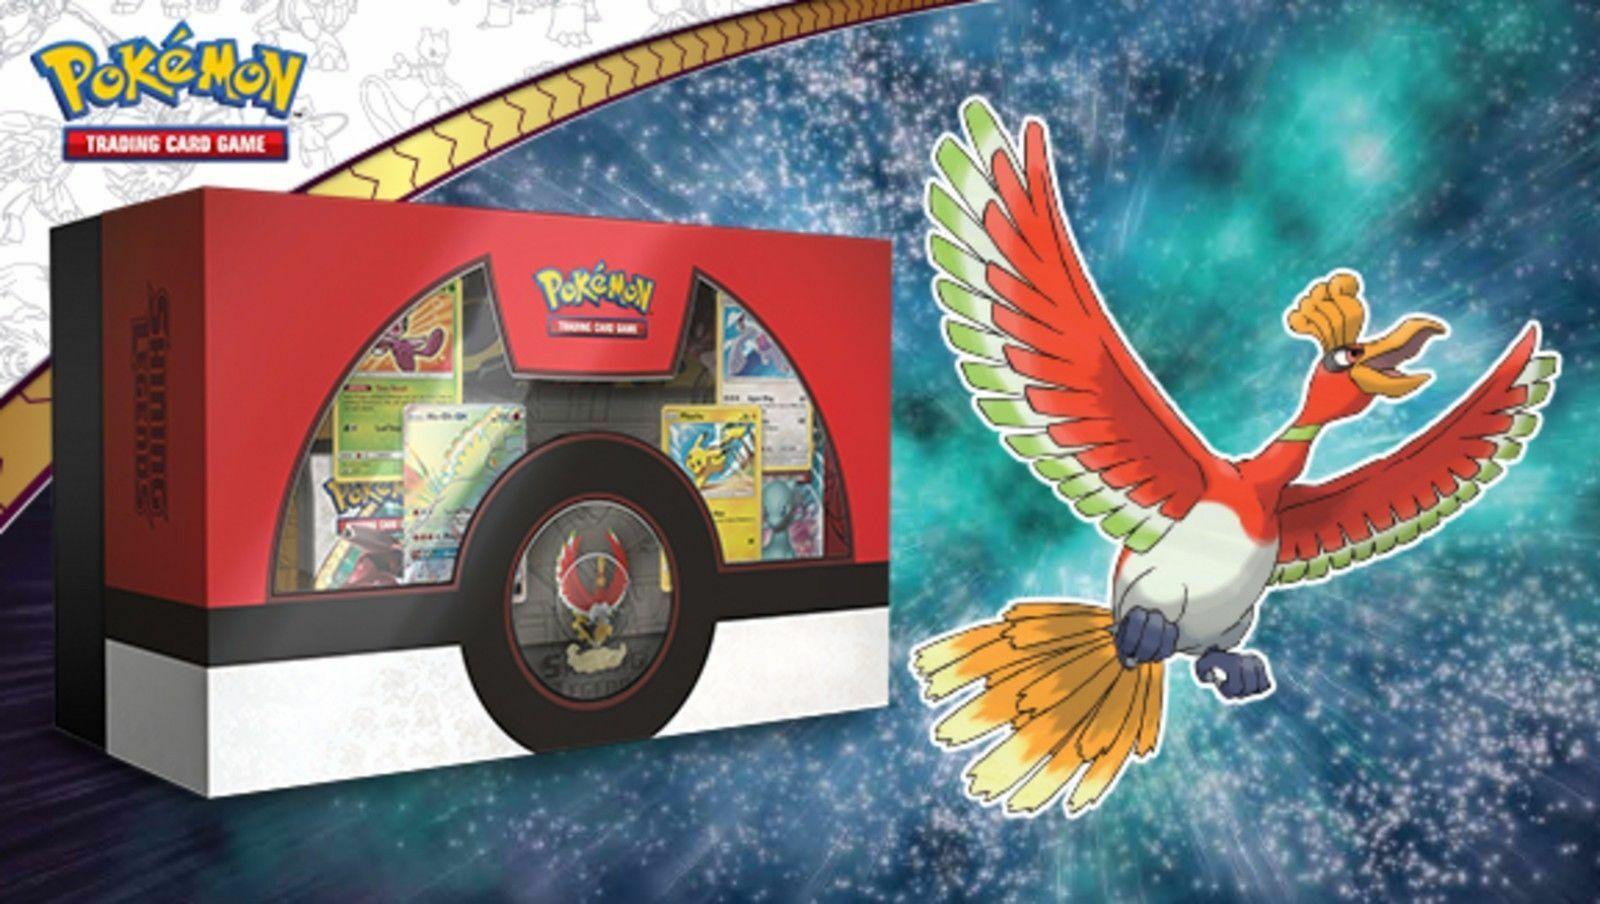 Pokemon Shining Legends Super Premium Collection + Pikachu & Mewtwo Box Bundle image 6